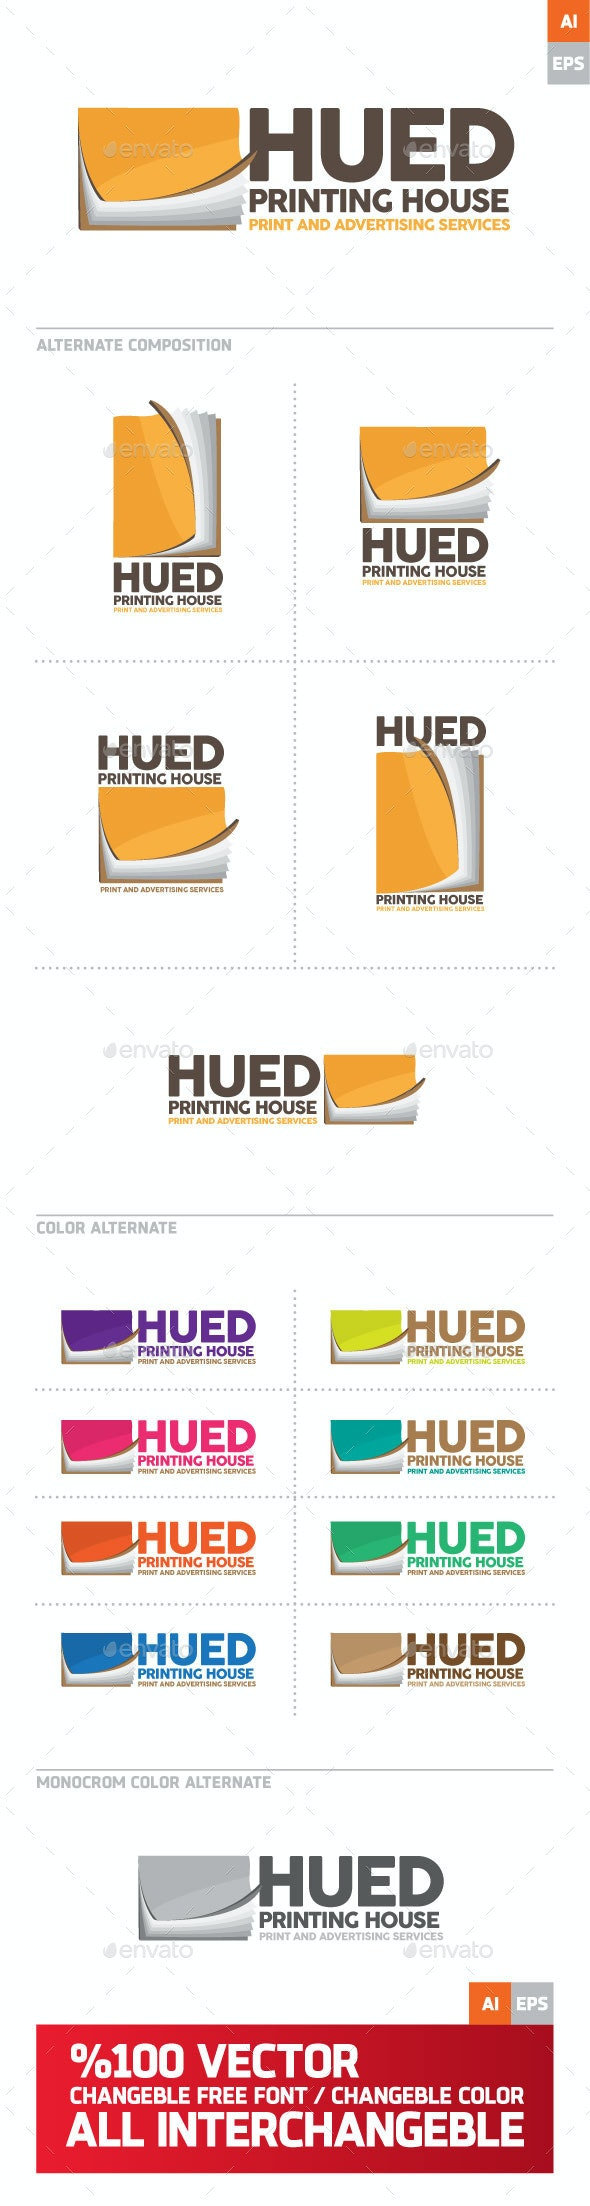 Hued Printing House Logo - Objects Logo Templates